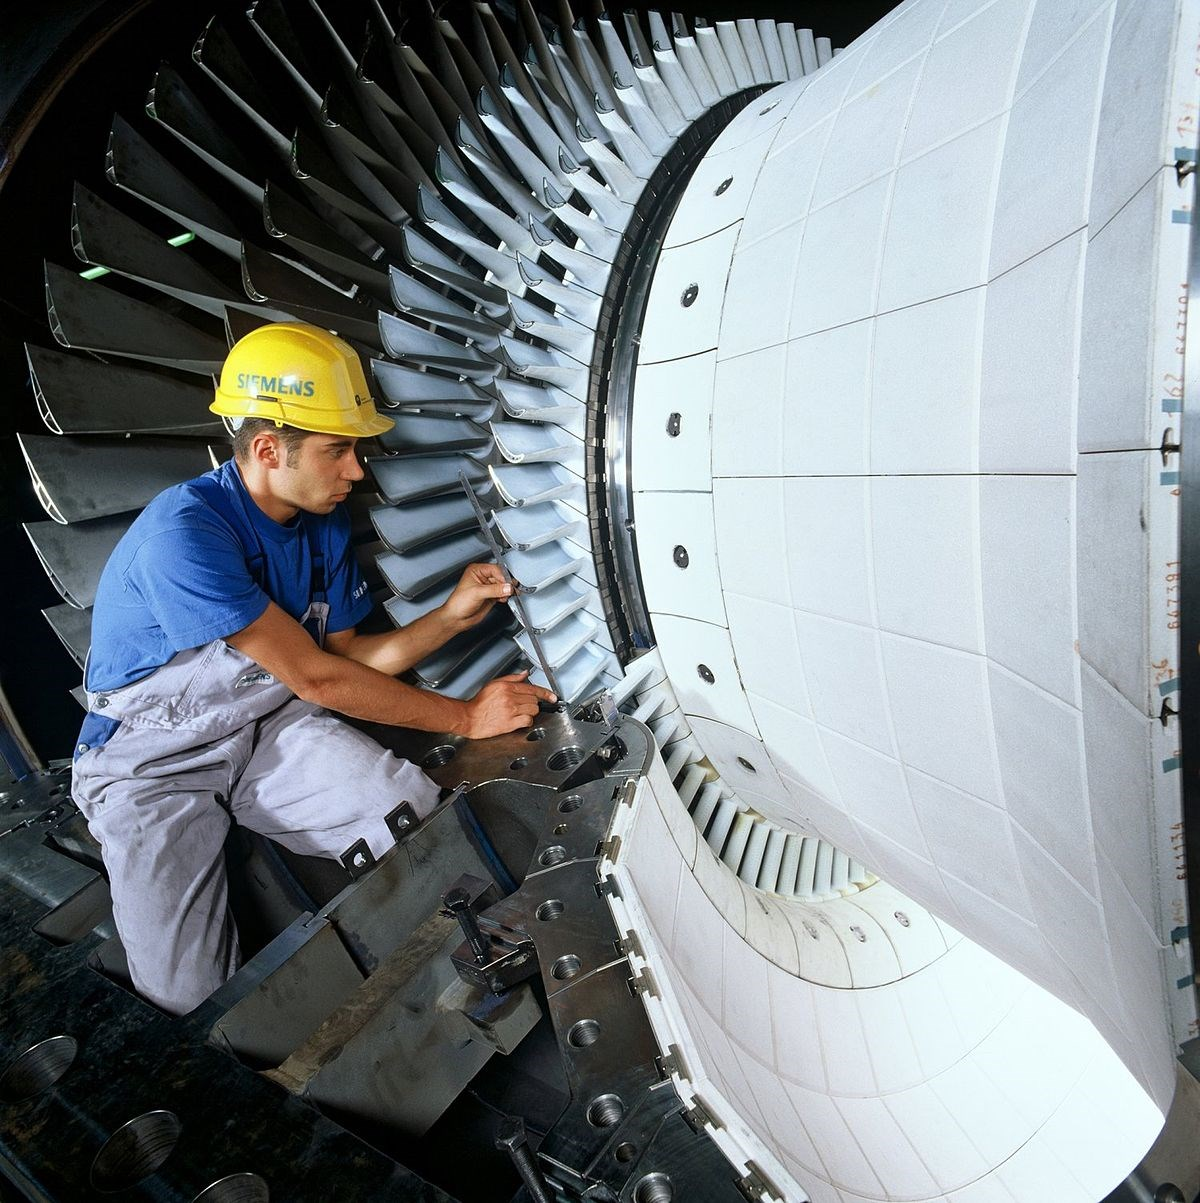 Siemens introduces 38-MW aeroderivative gas turbine for oil